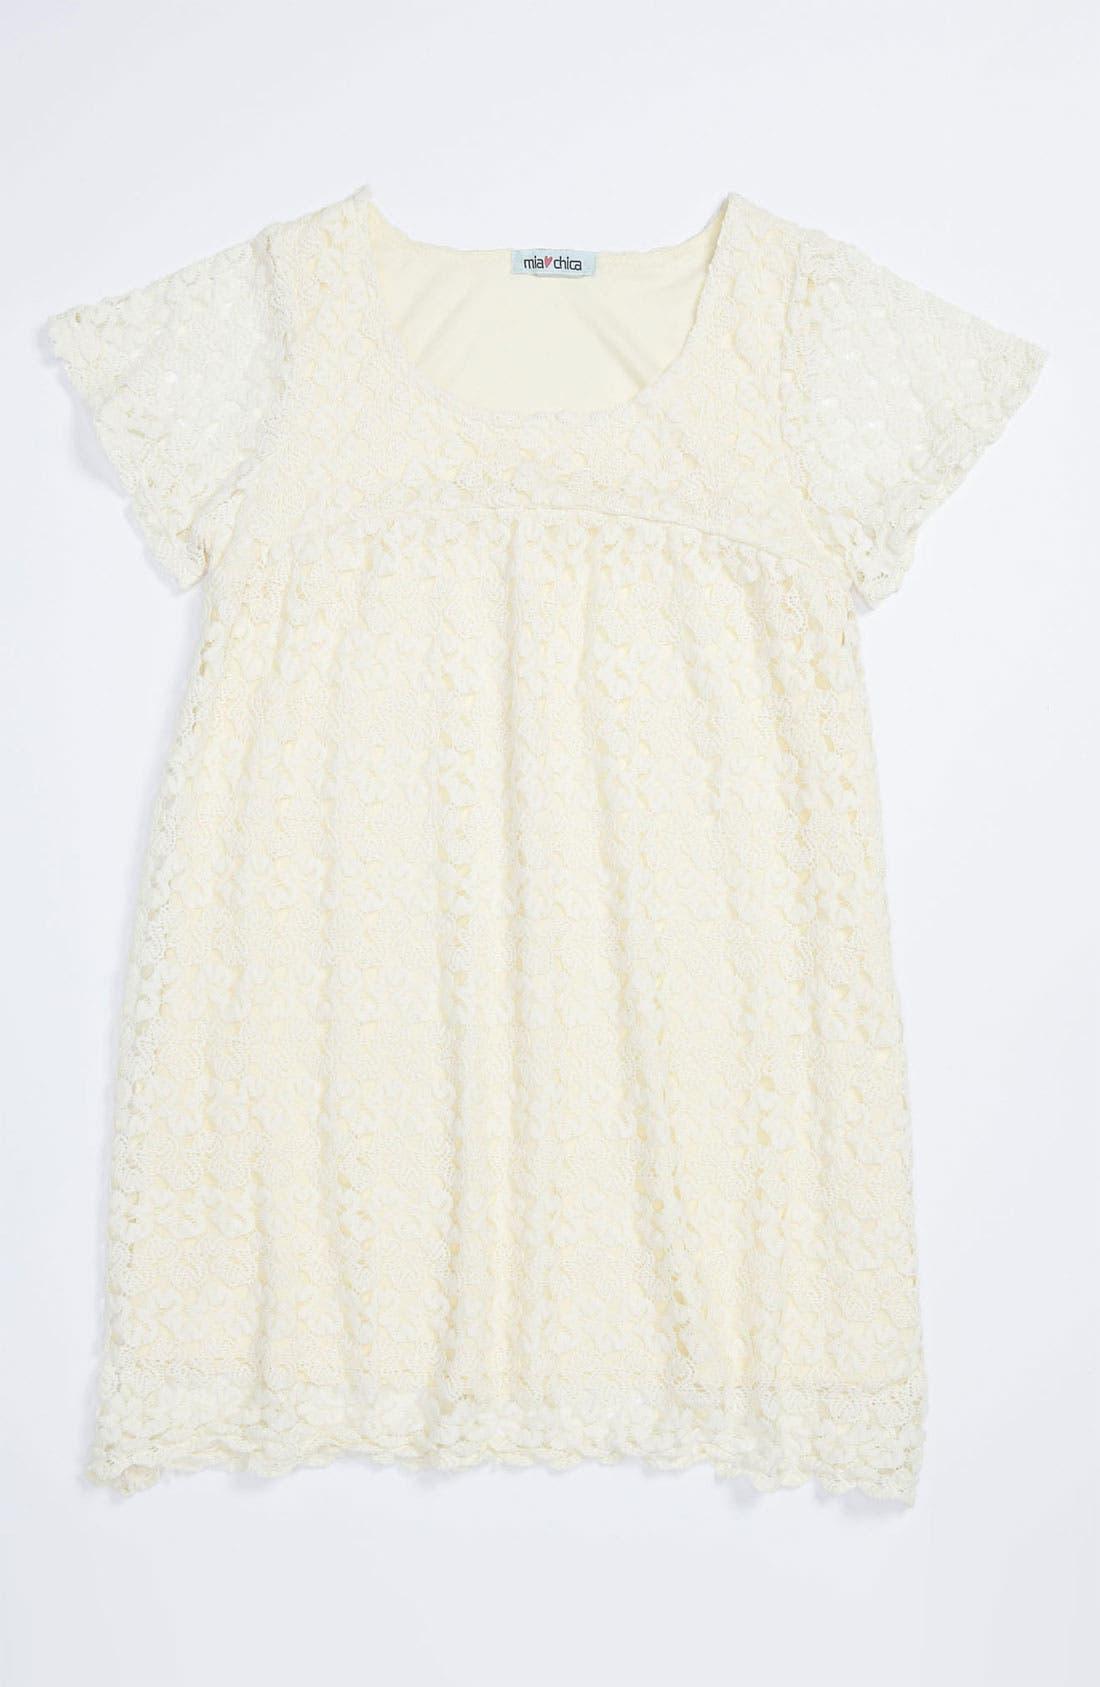 Main Image - Mia Chica Crochet Dress (Big Girls)